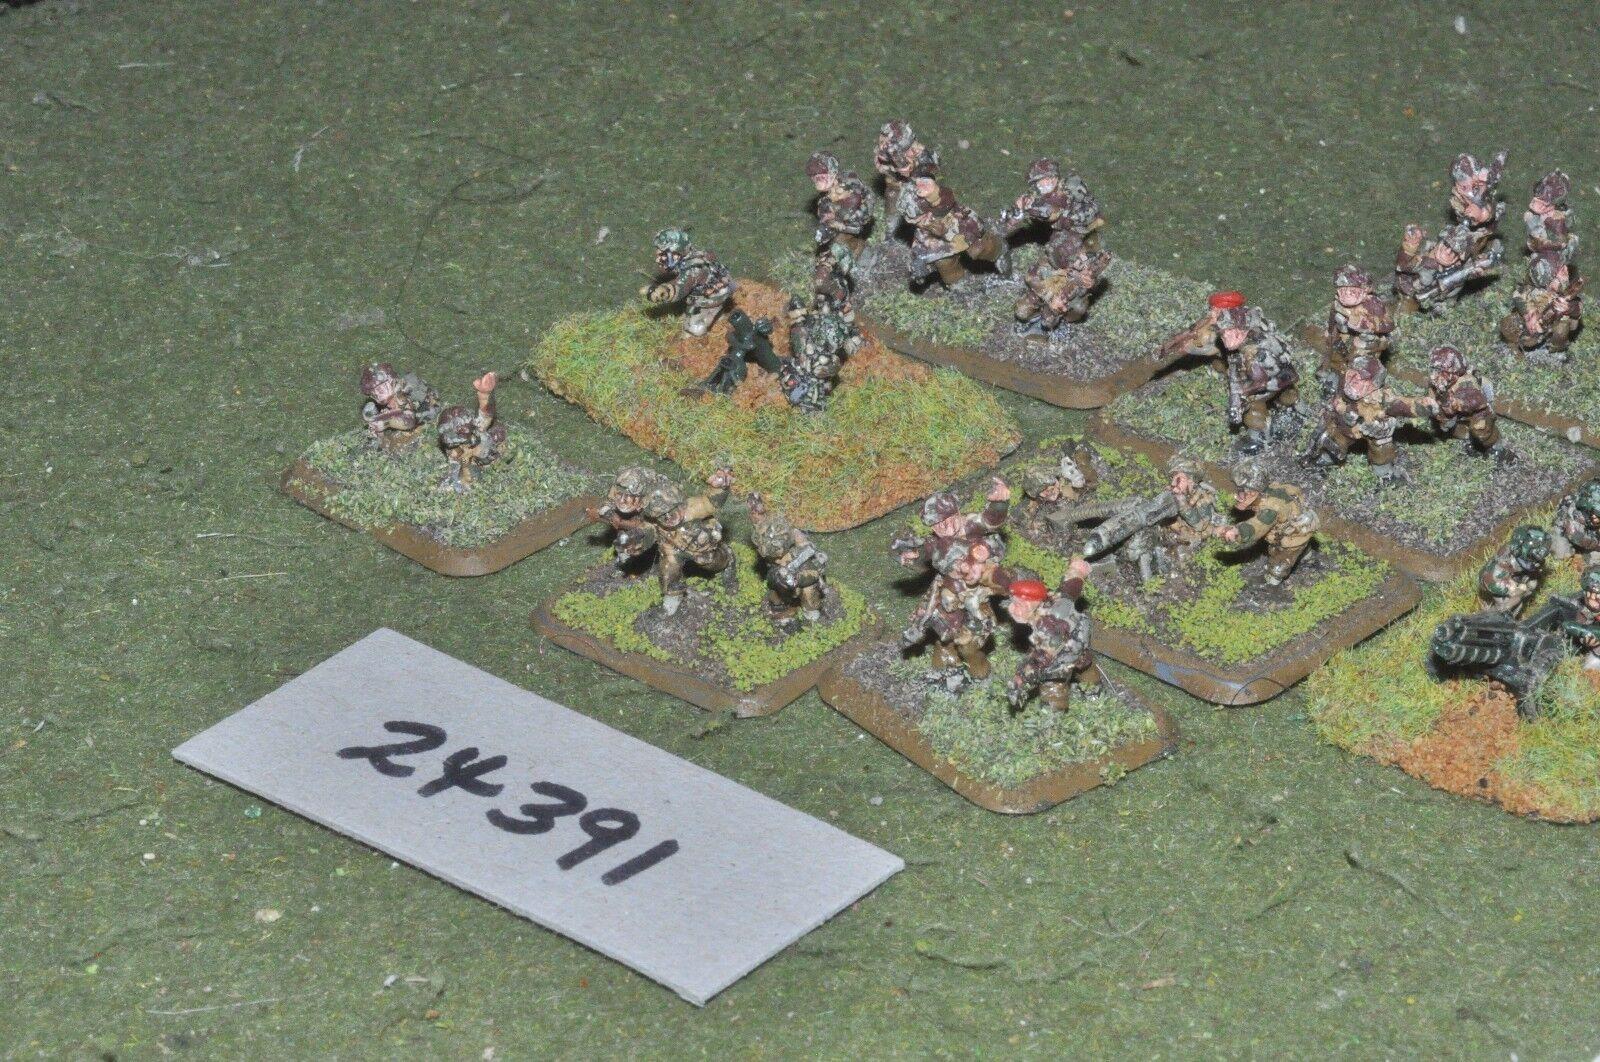 15mm WW2   british - platoon para 33 figures - inf (24391)